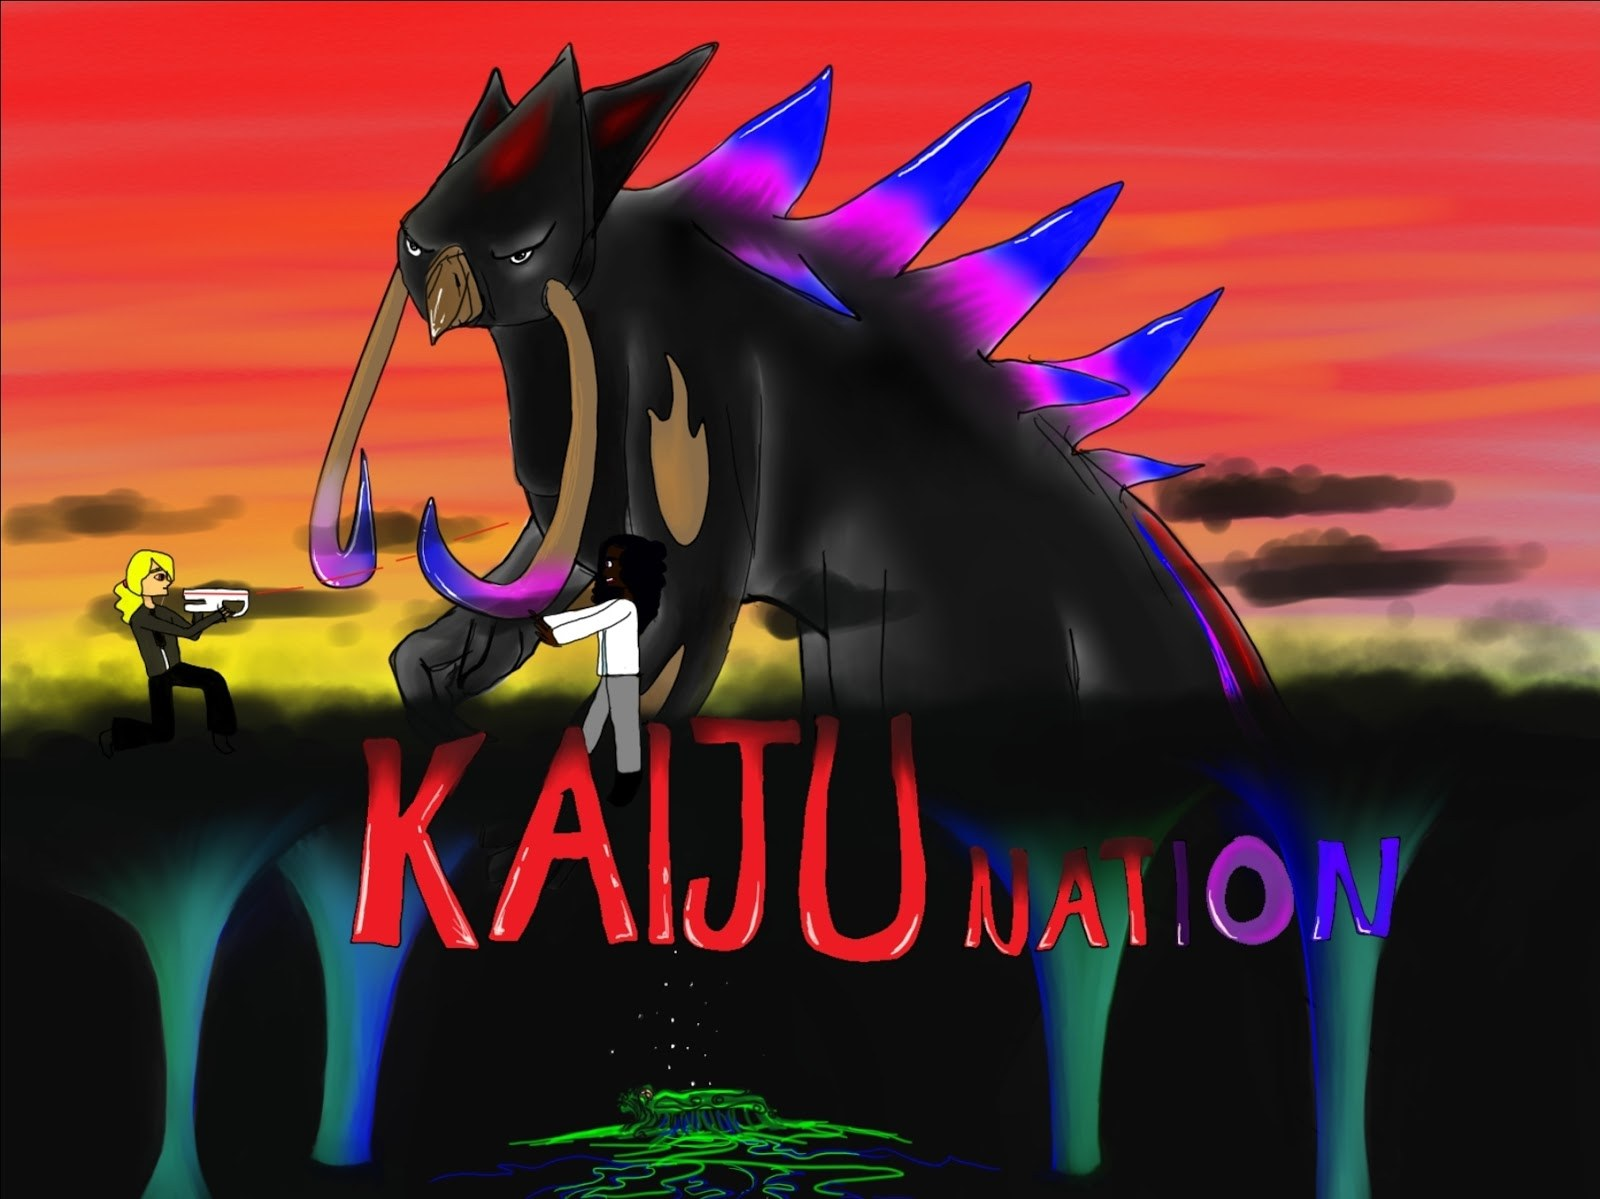 Kaiju Nation